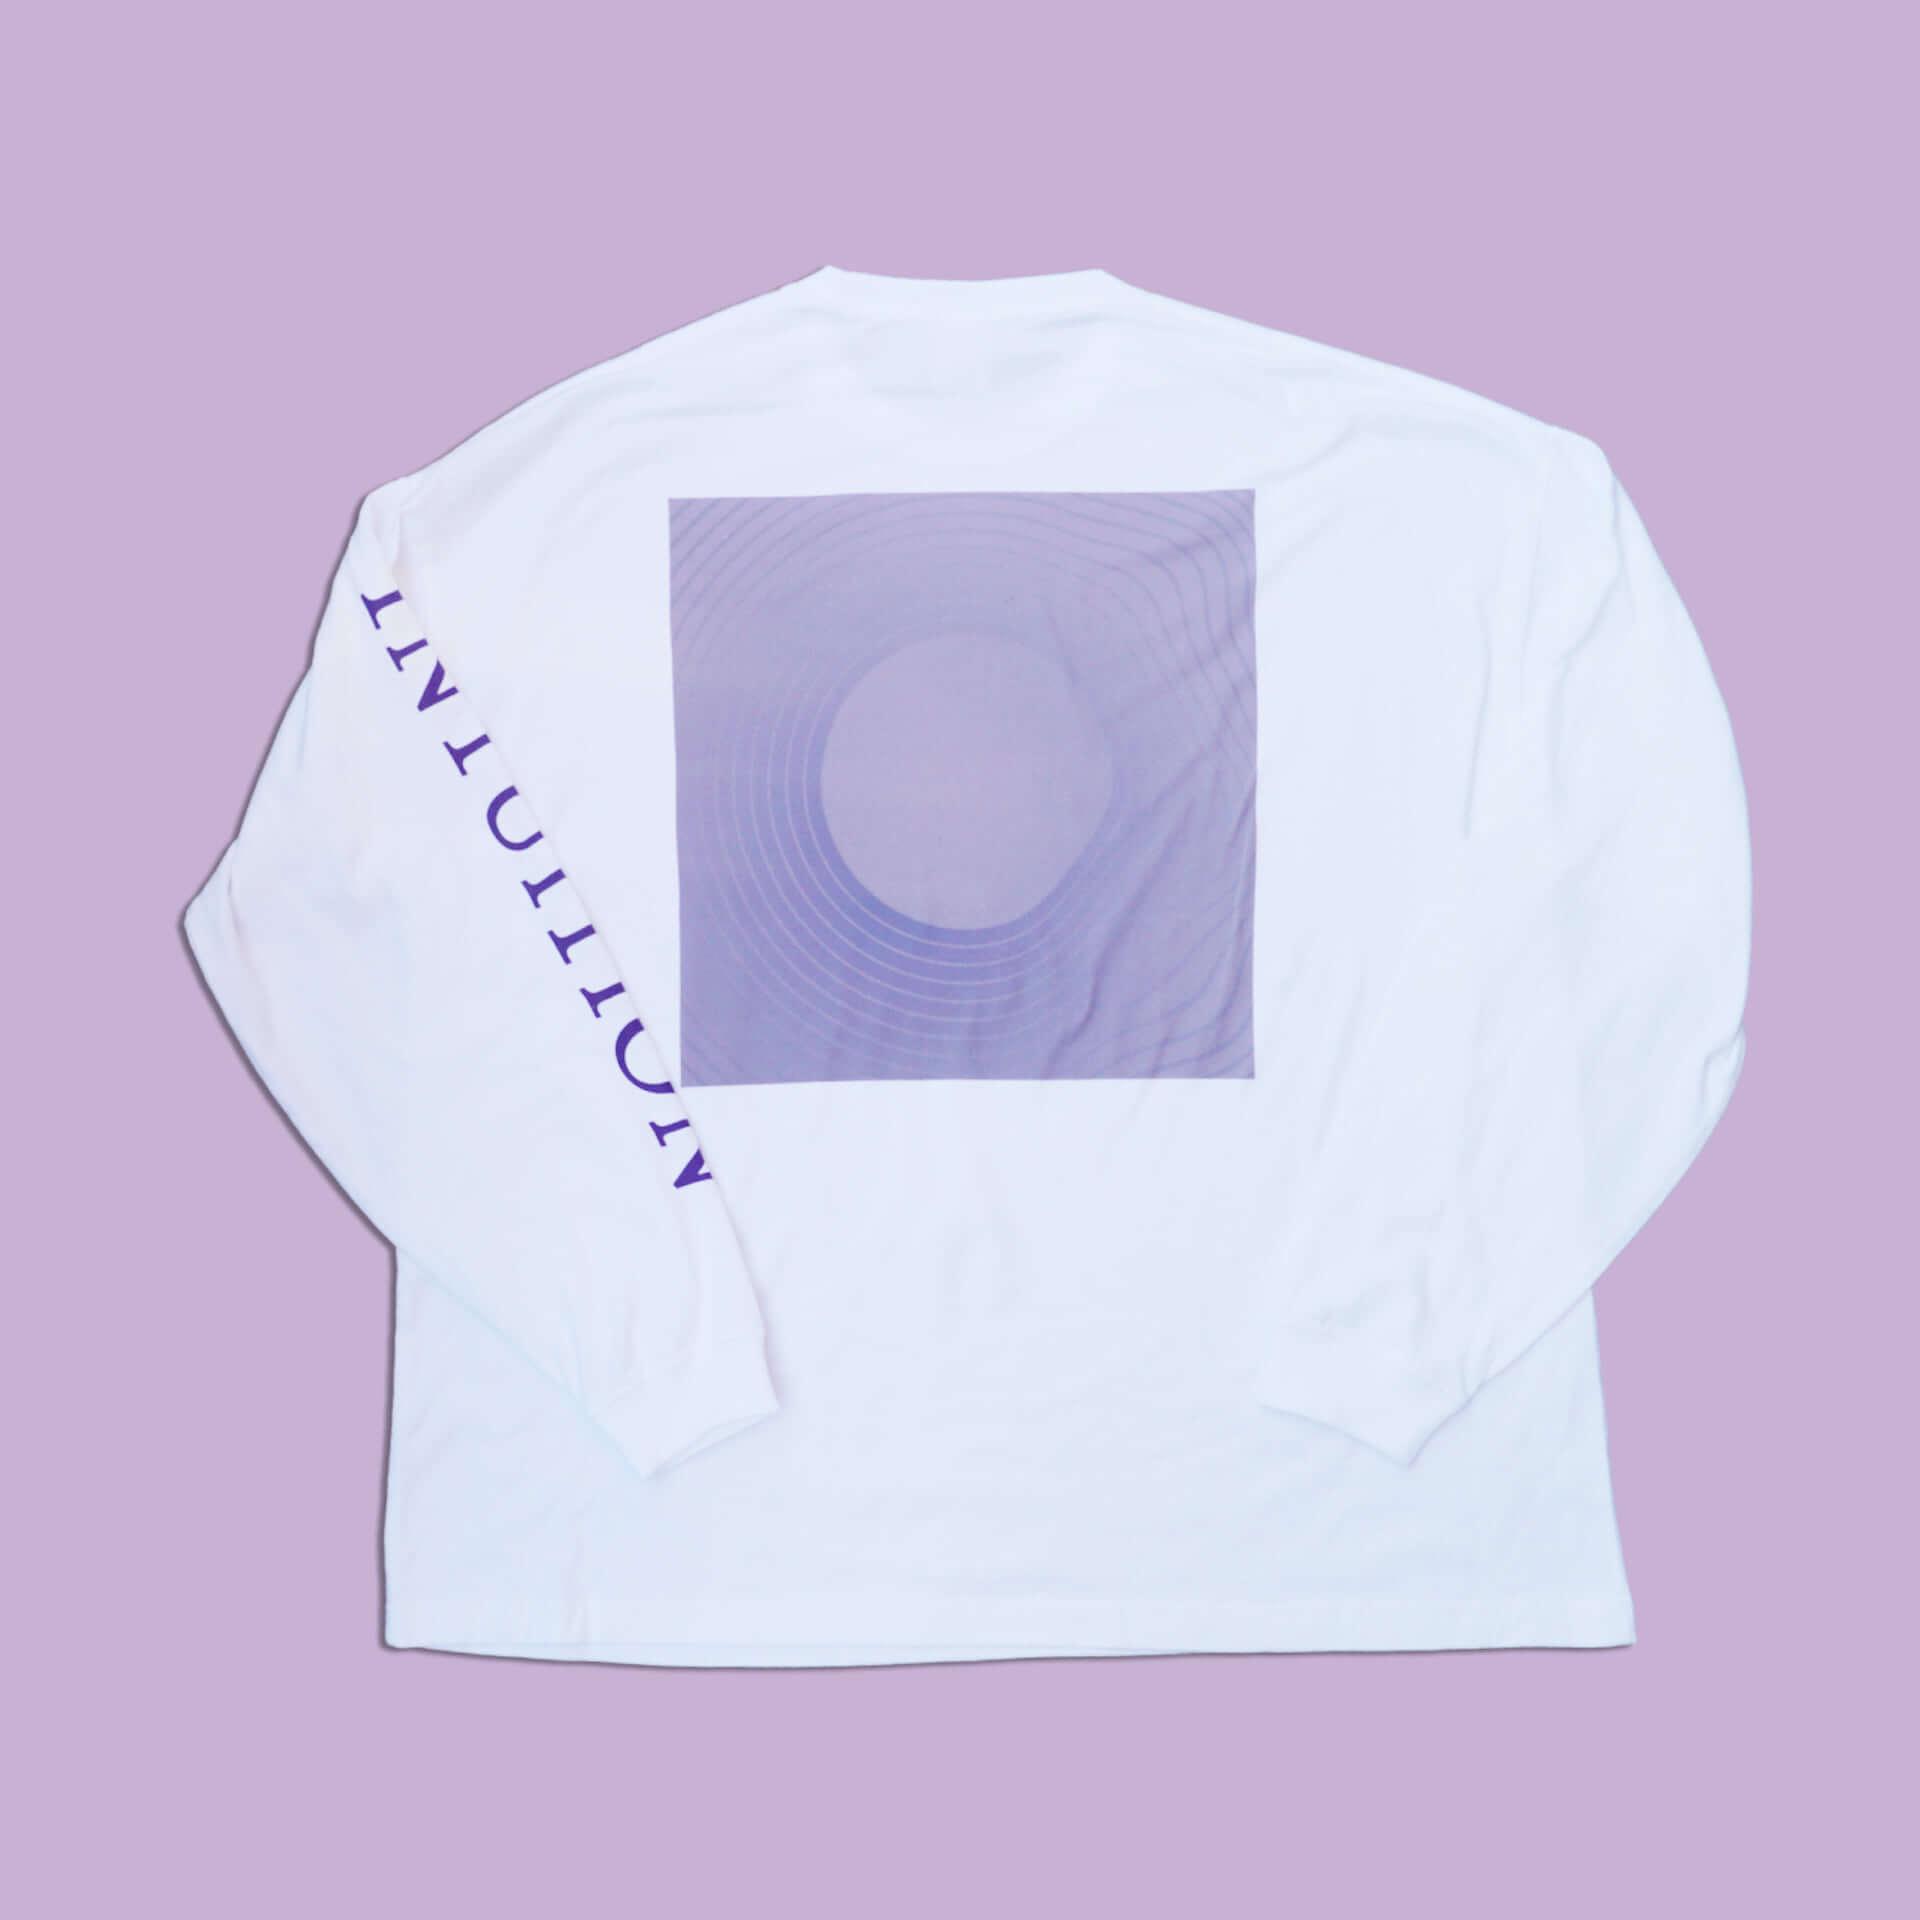 "erie&FKDの新曲""Intuition""がデジタルリリース!Shinji ItoUによるアートワークを施したTシャツも発売 music210225_erie_2-1920x1920"